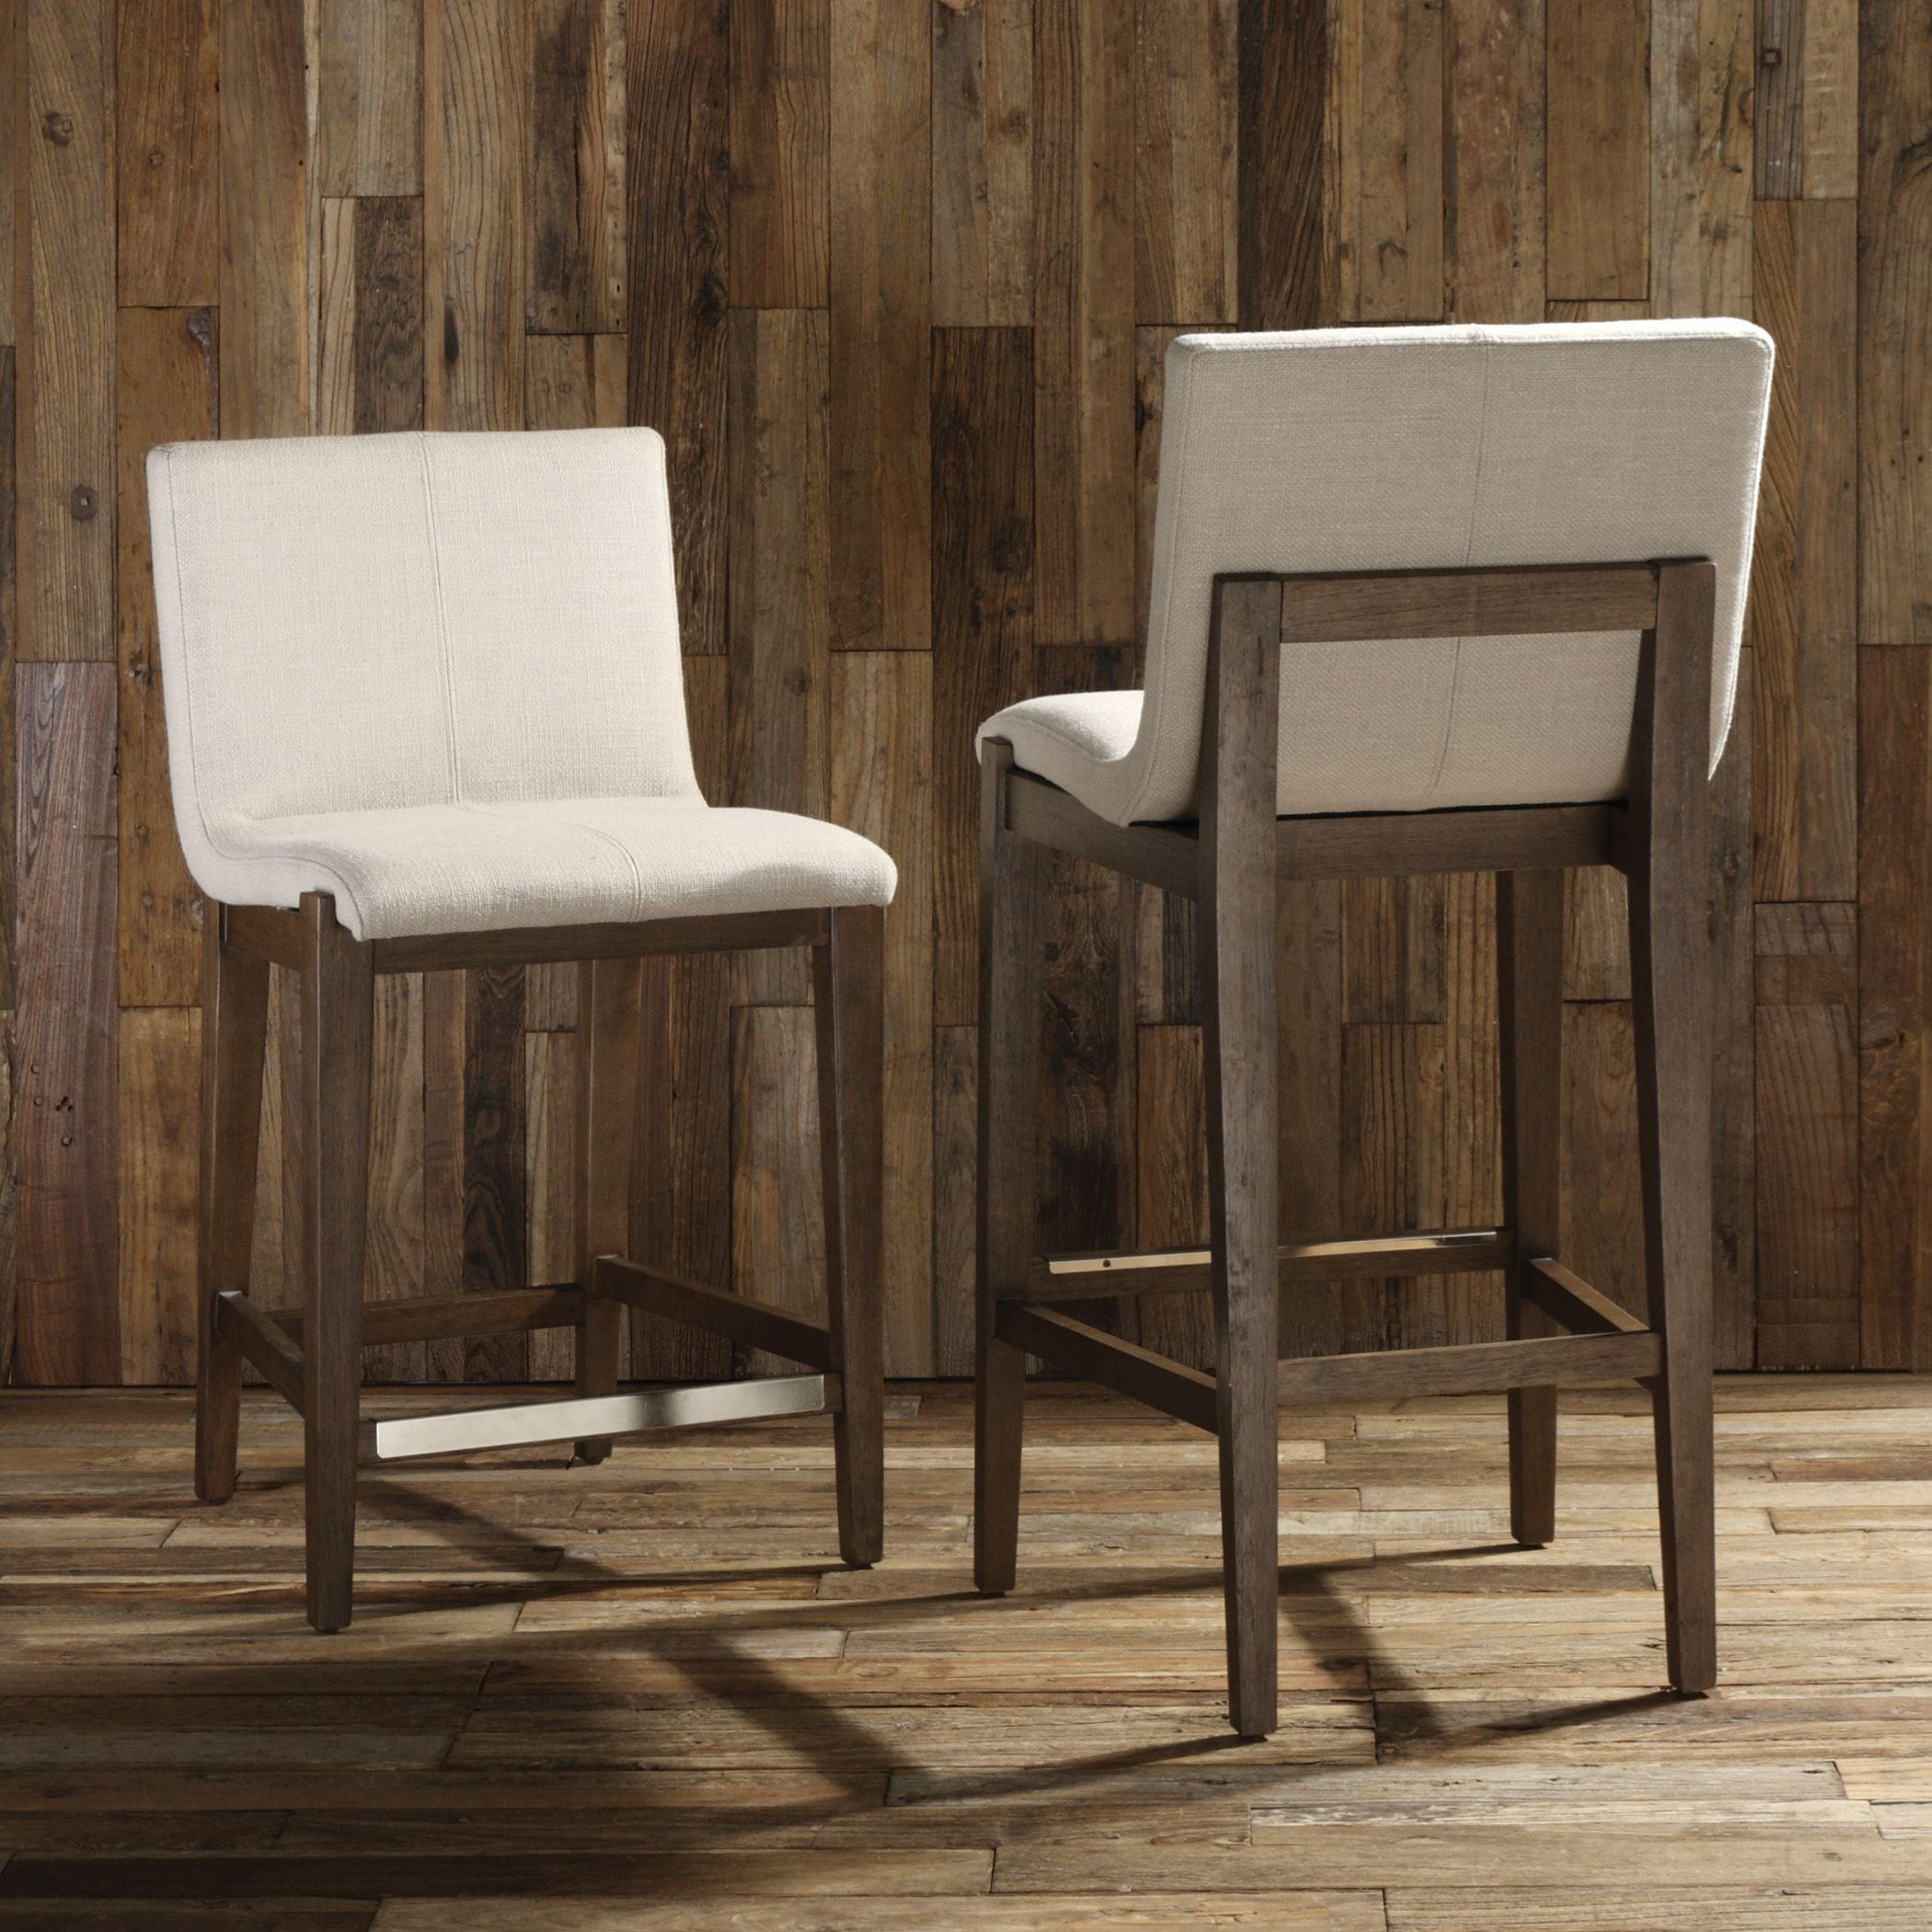 Uttermost Accent Furniture Klemens Linen Counter Stool